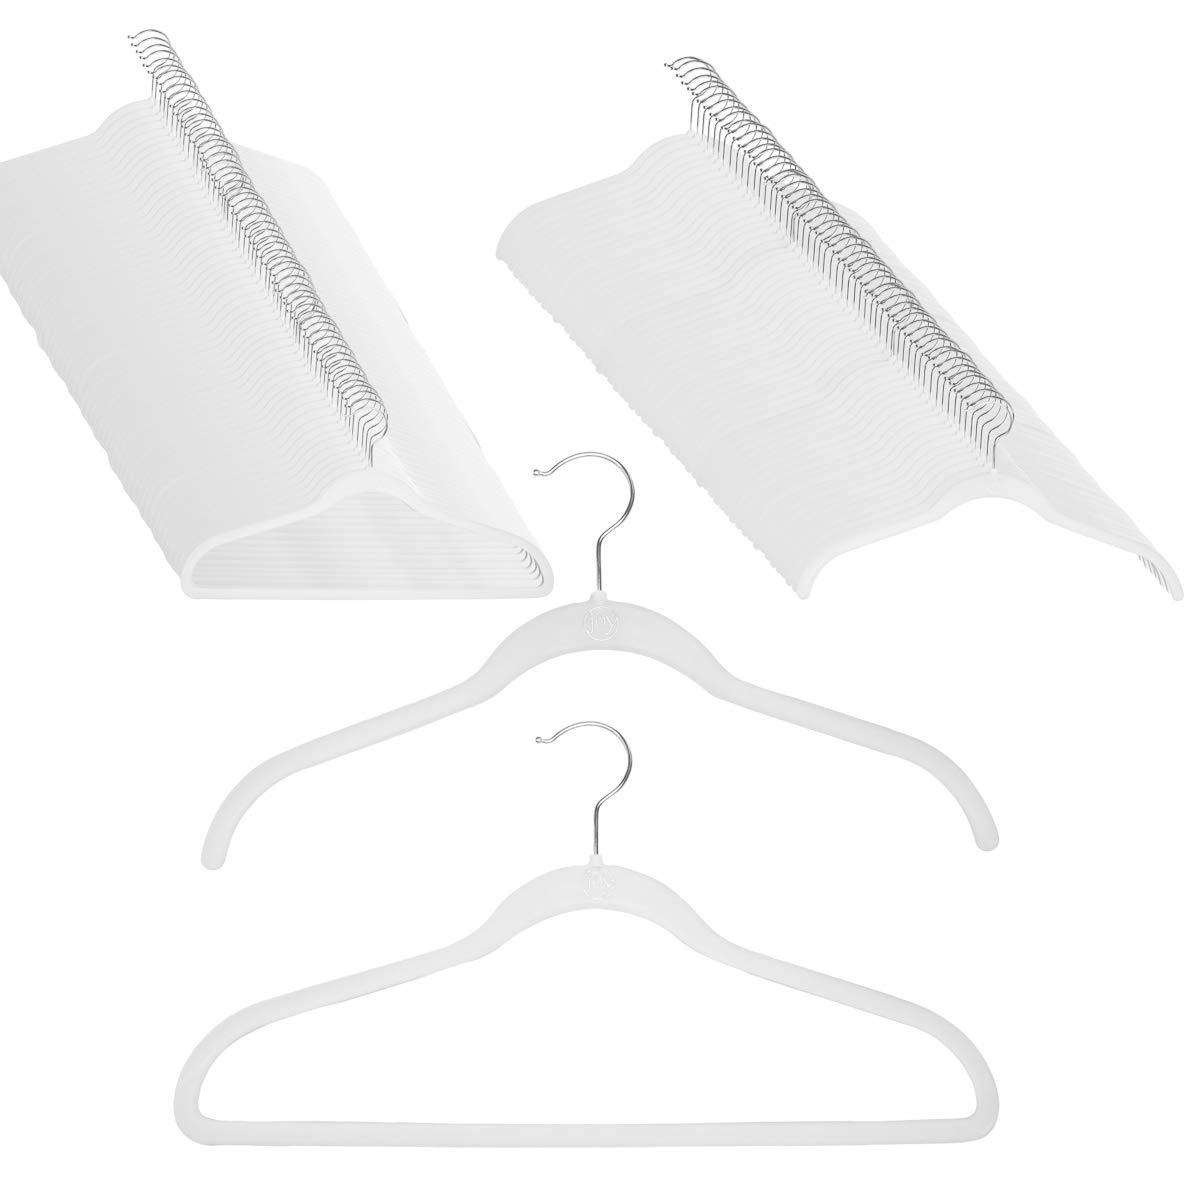 Joy Mangano 120 Pack White Huggable Hangers Non Slip Velvet Hangers Space Saving Clothes Hangers by Joy Mangano (Image #1)